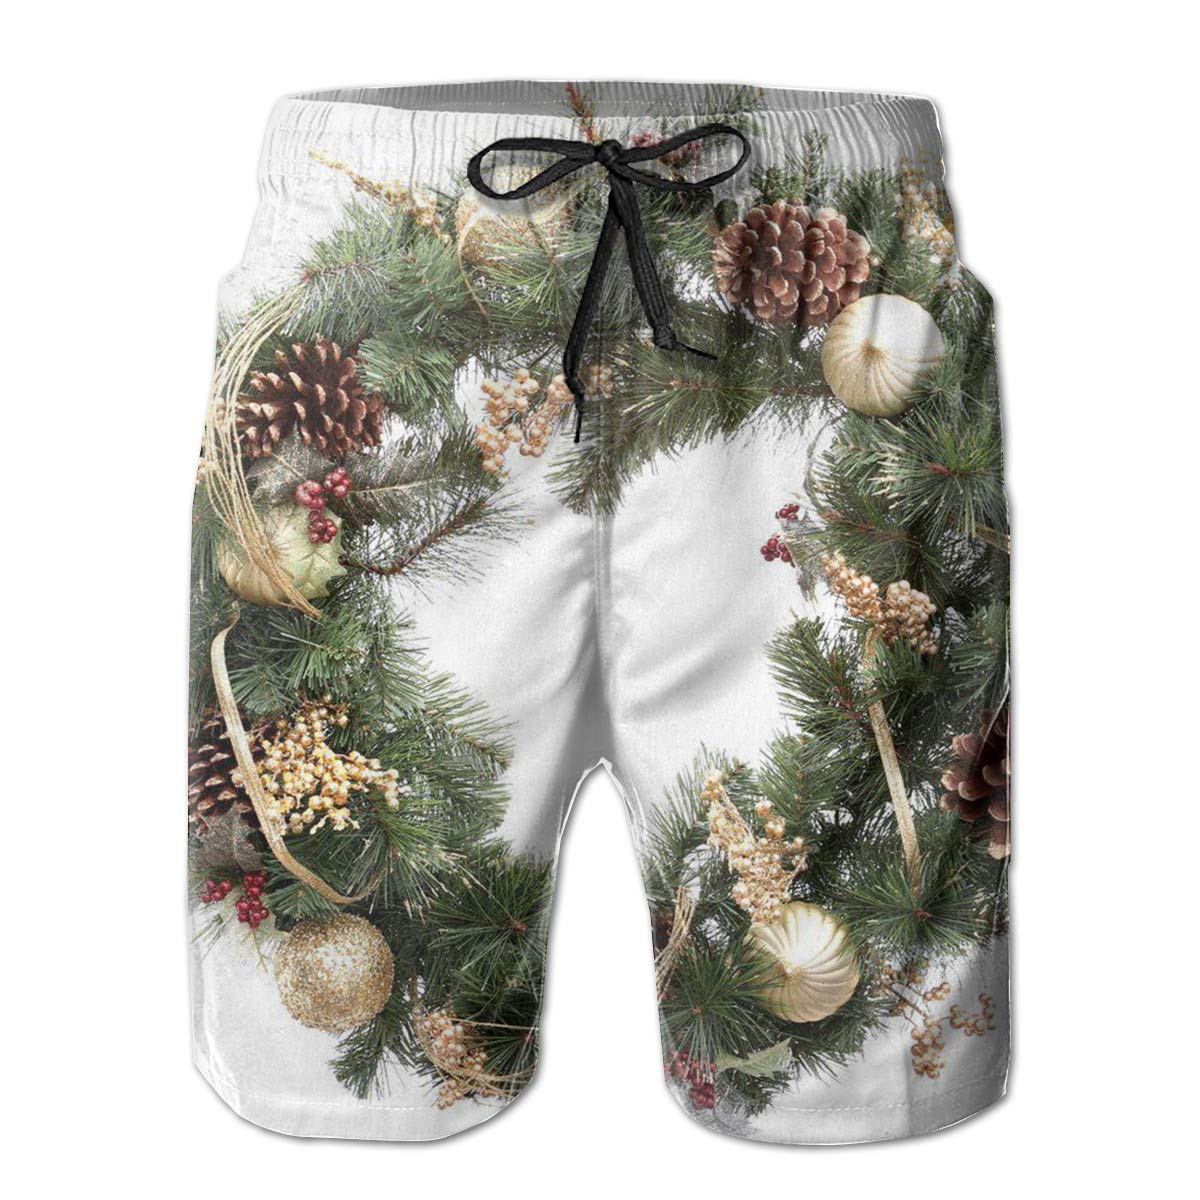 Cute Christmas Wreath Mens Beach Shorts Linen Casual Fit Short Swim Trunks